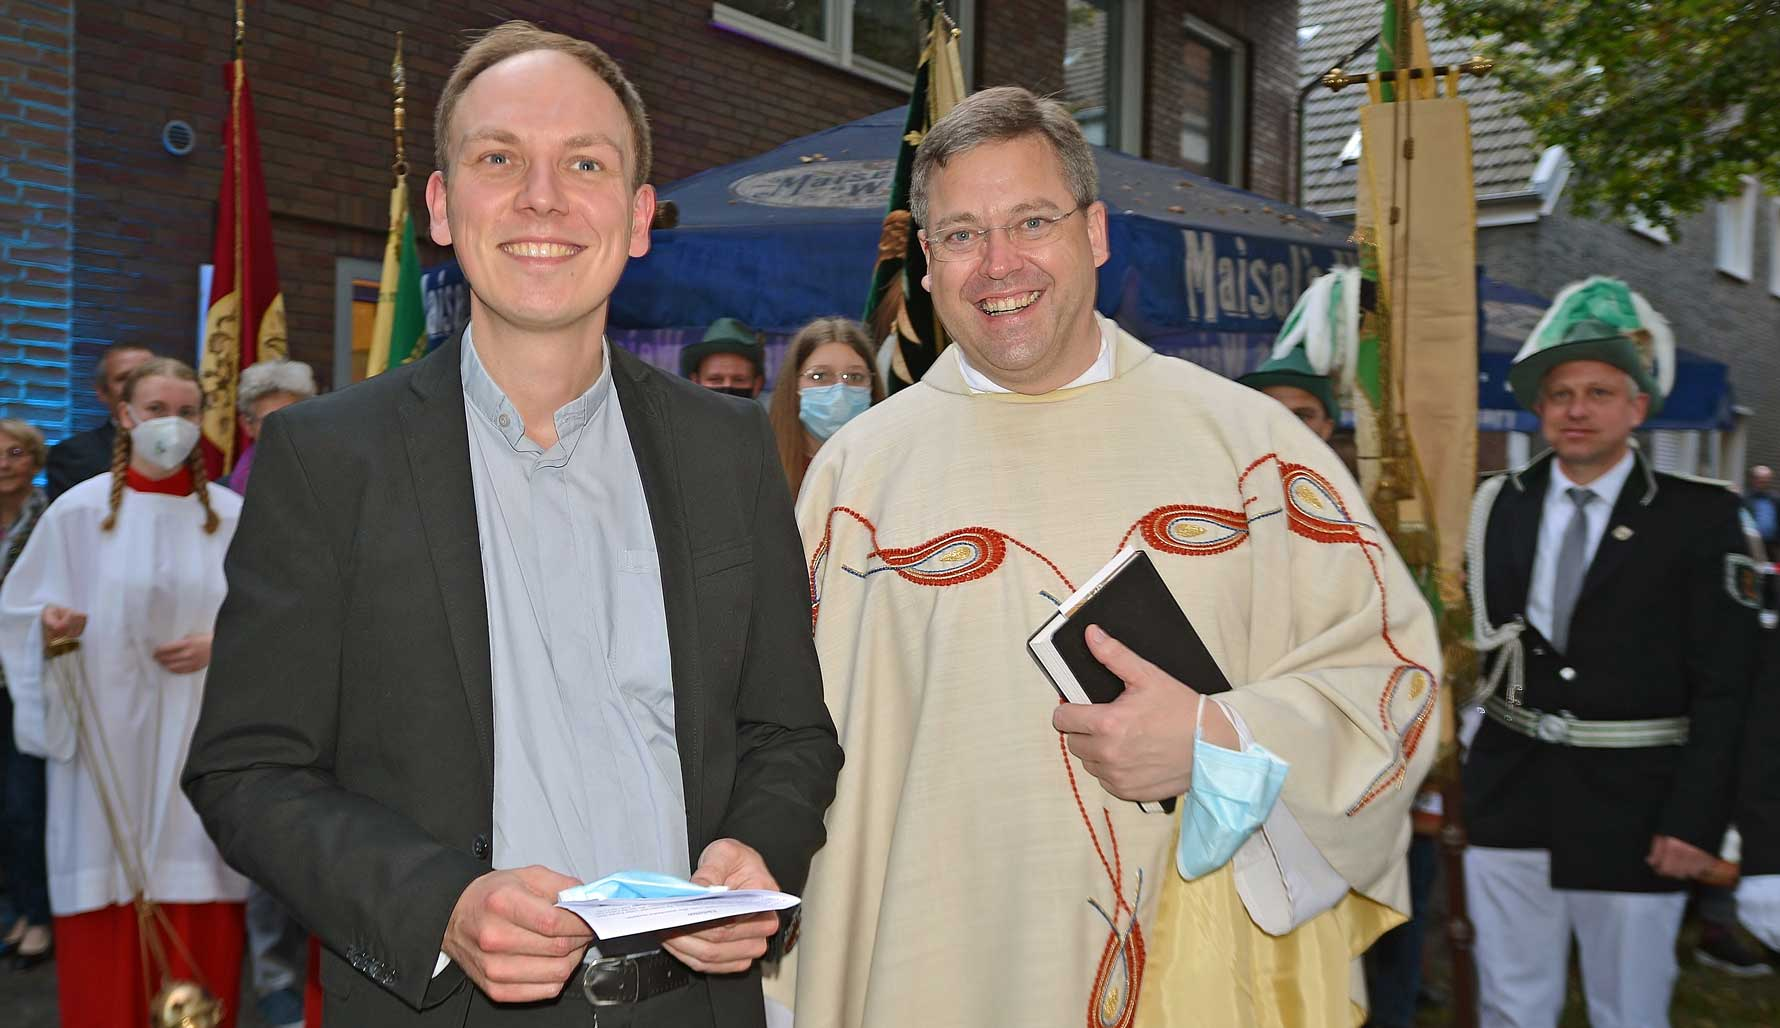 Pfarrer-Fabian-Tilling-und-Dechant-Benedikt-Ende